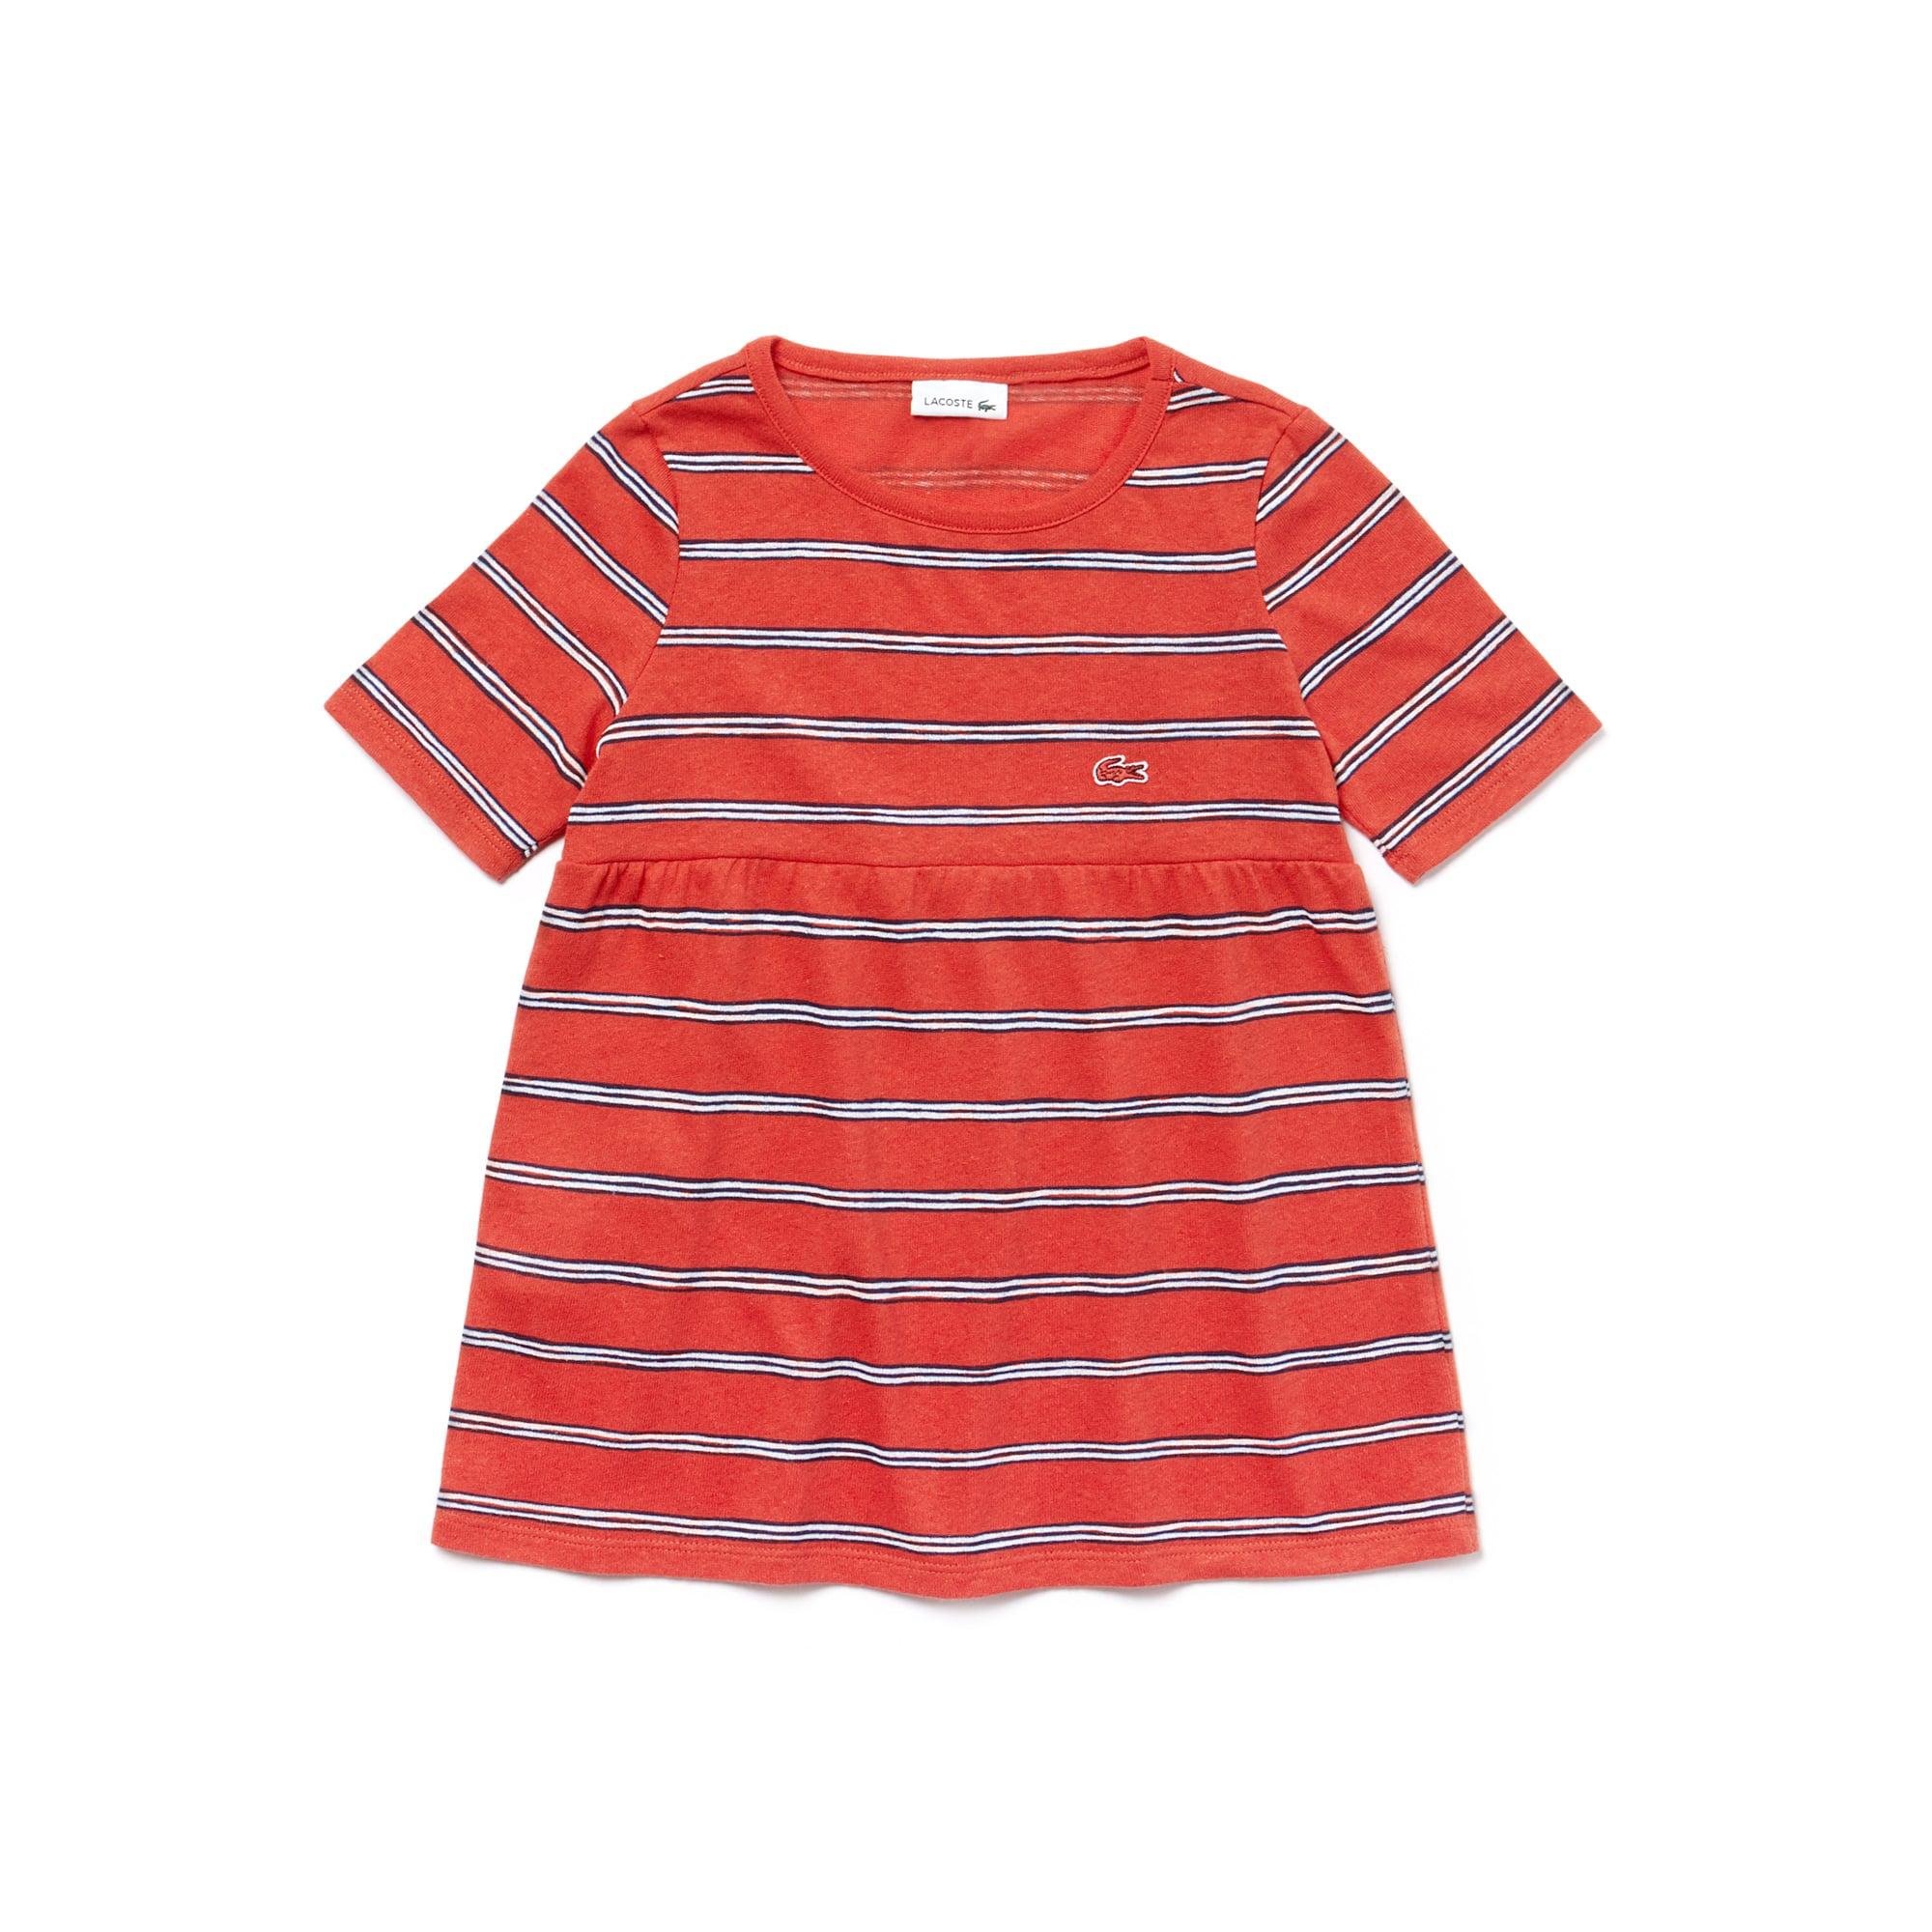 Girls' Crew Neck Striped Cotton And Linen Jersey T-shirt